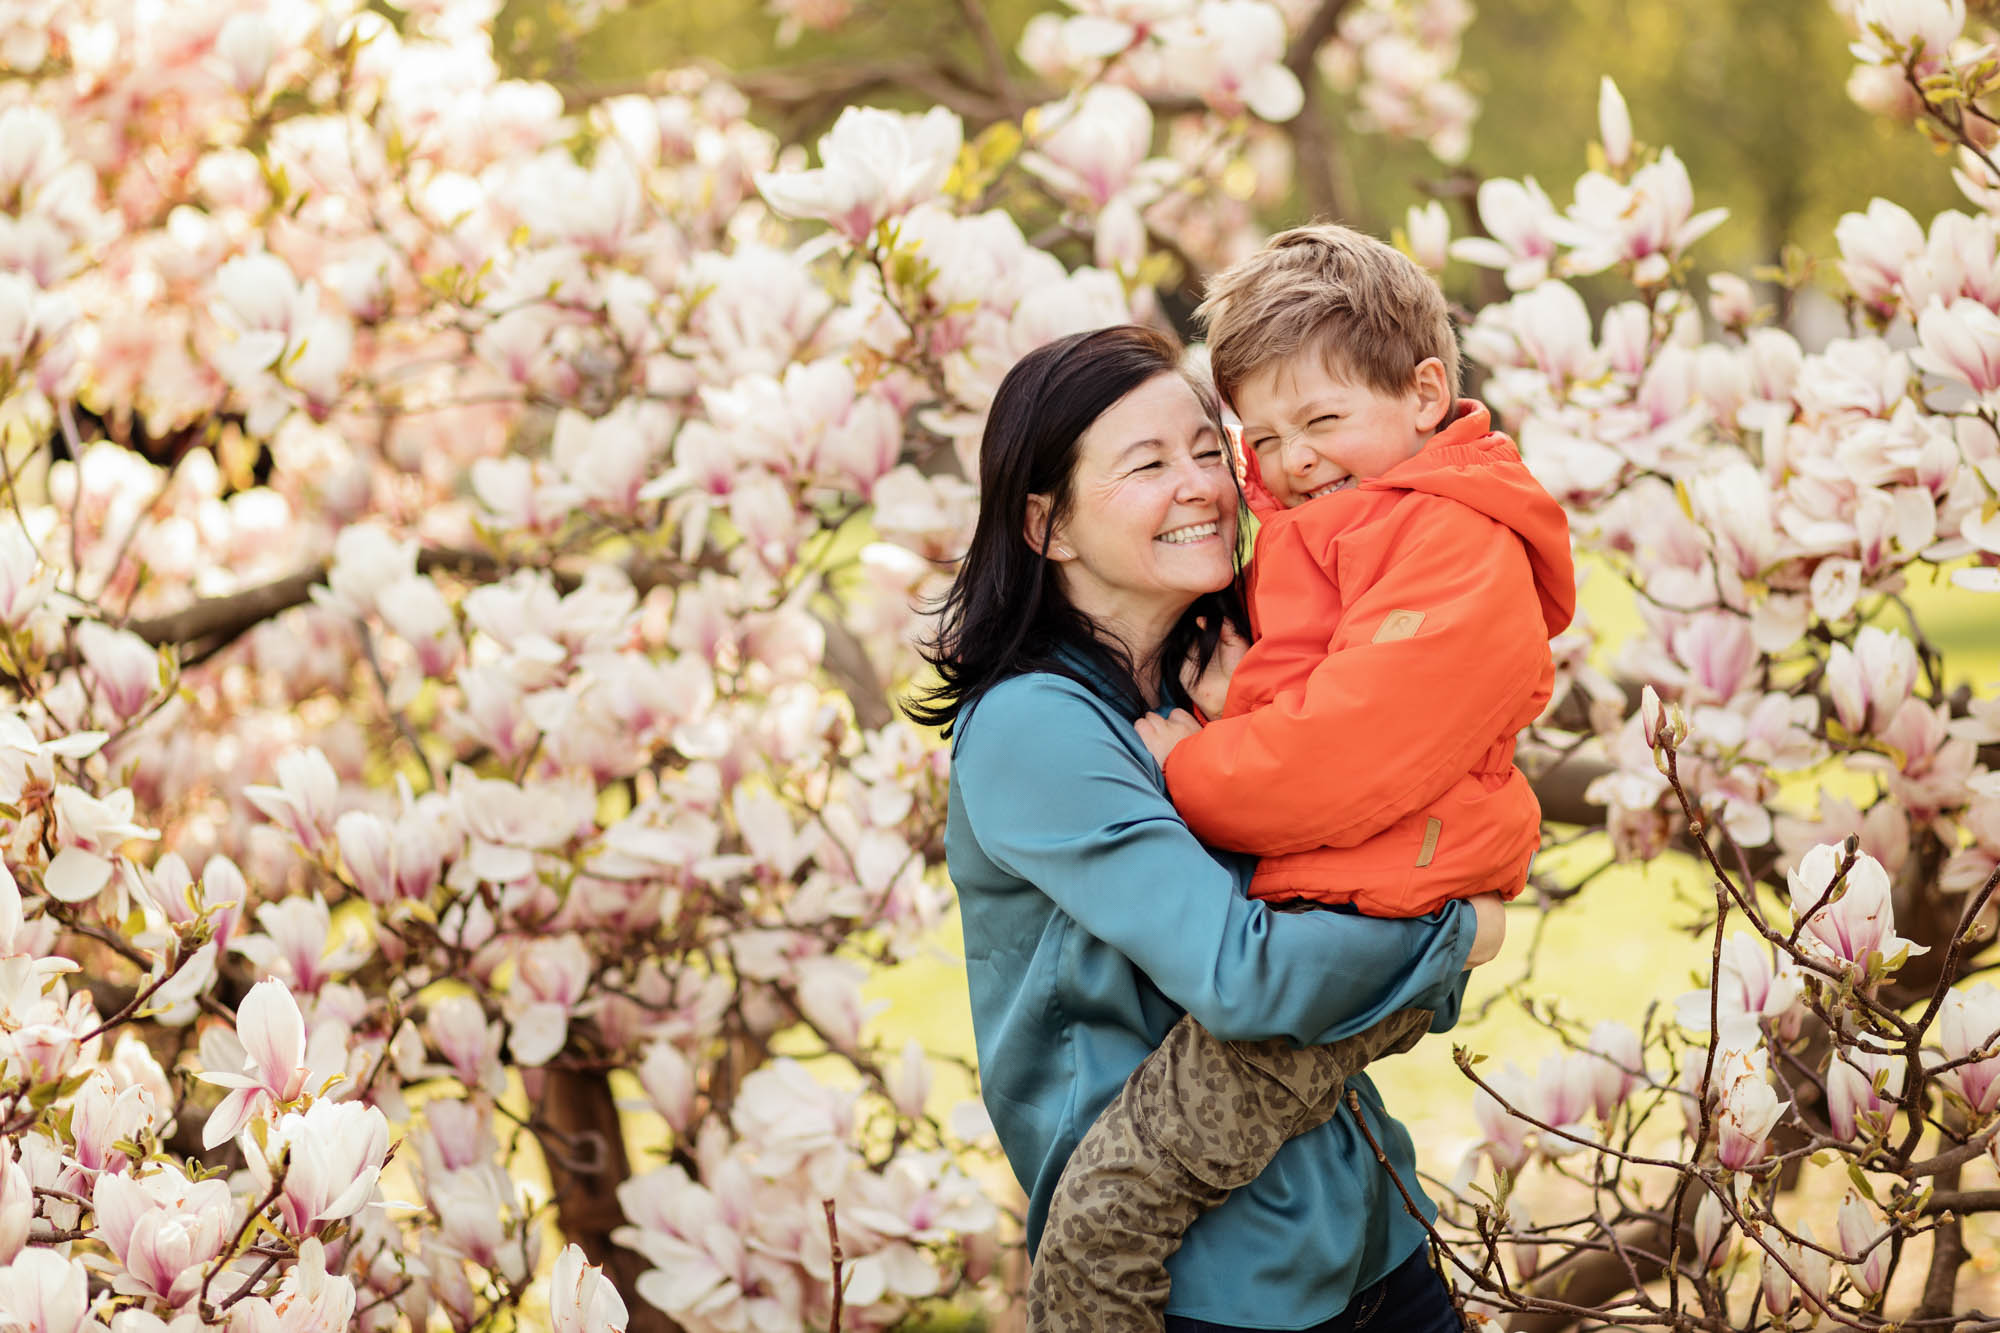 Mum with her son in the magnolias near Landesmuseum Zürich